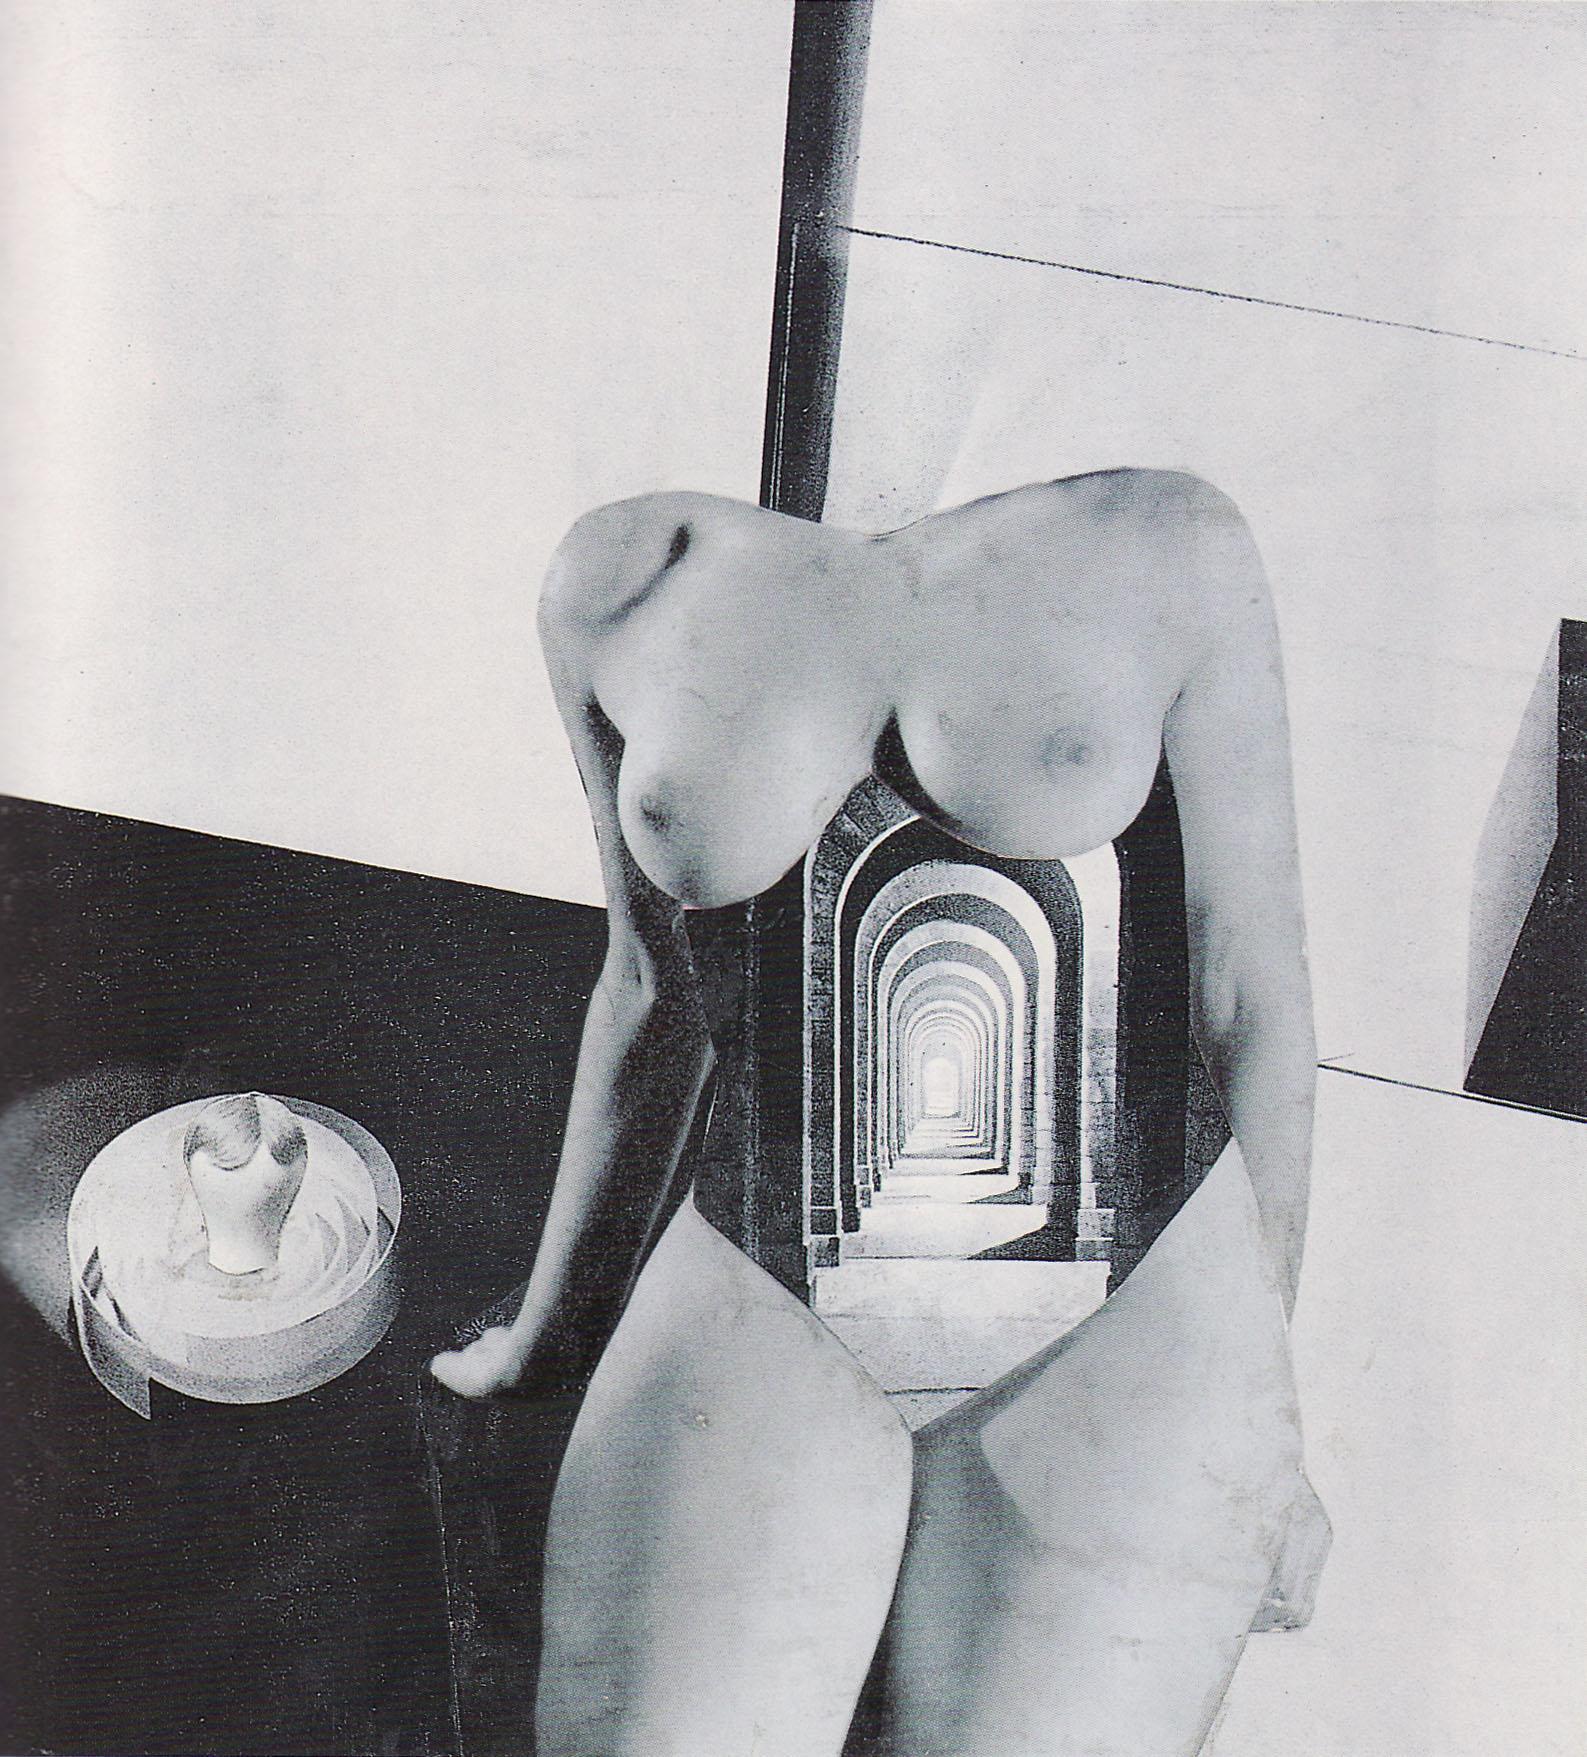 Karel Teige- Collage # 318, 1946. (c) Nachlass Karel Teige